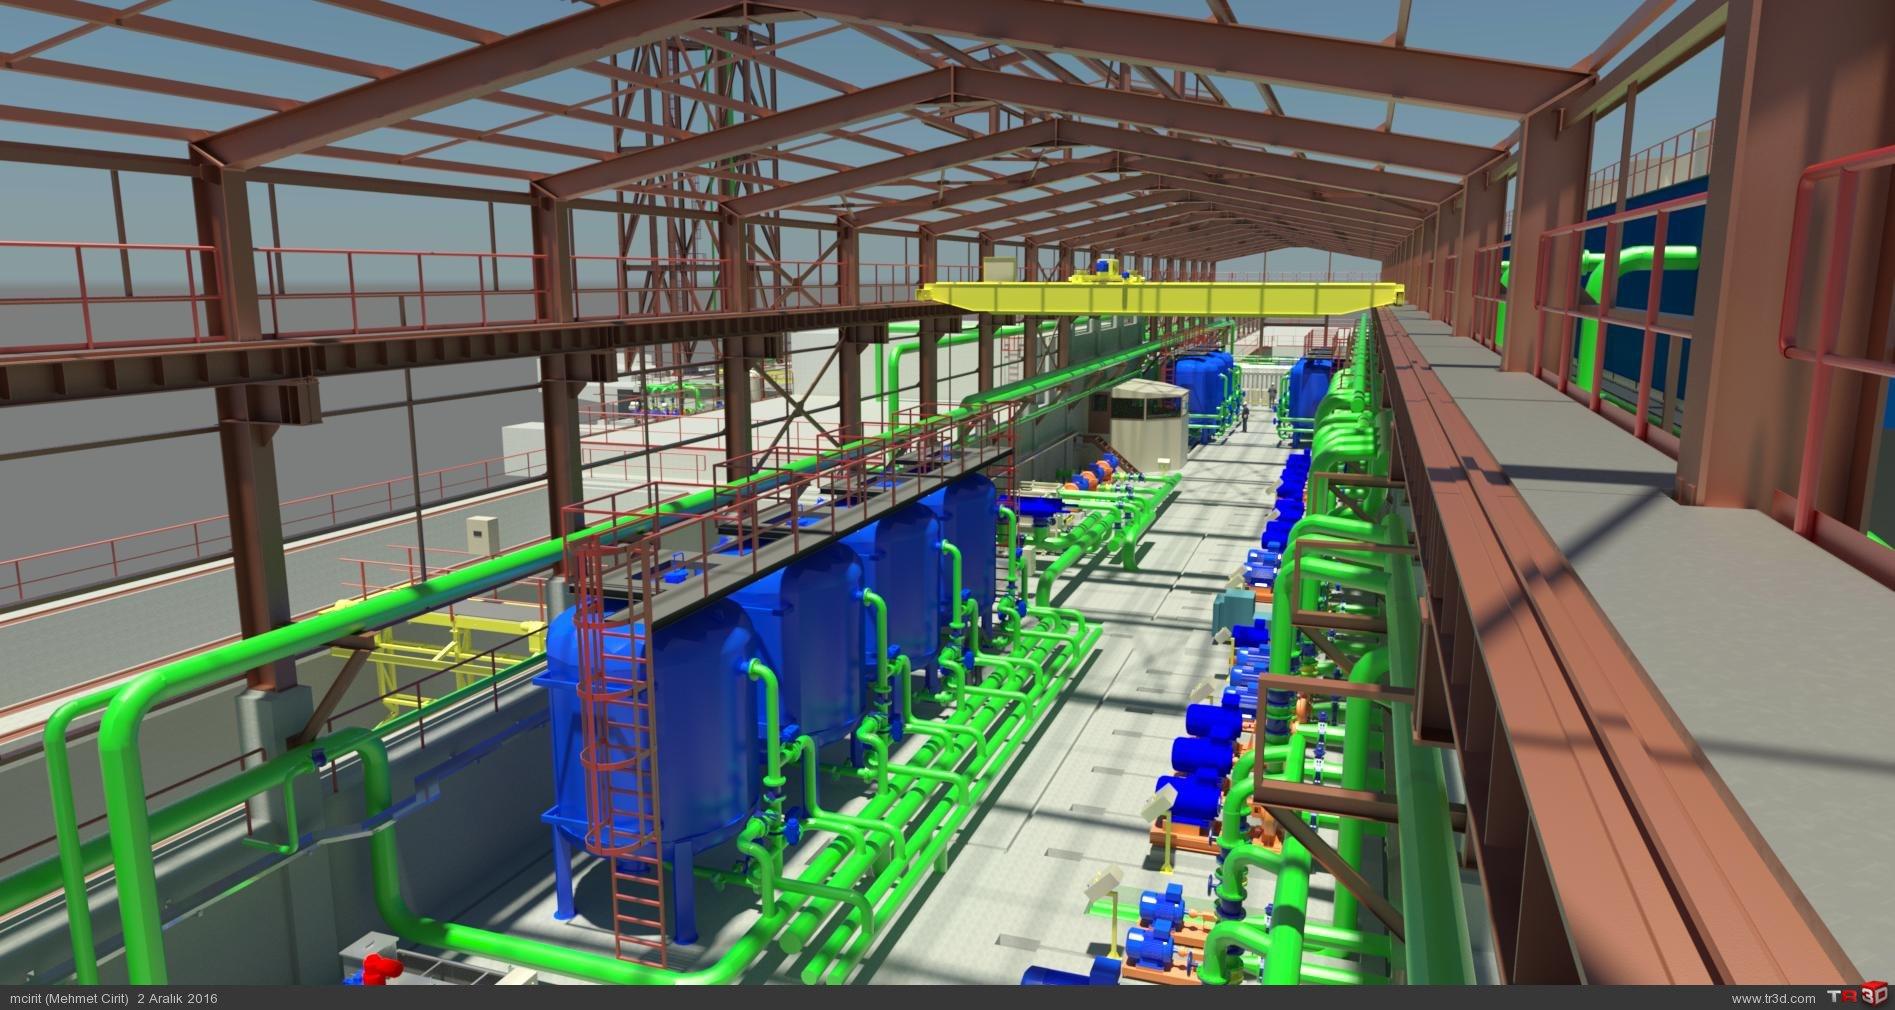 Fulad Nab Tabriz & ARC WT Co.  Water Treatment Plant 2